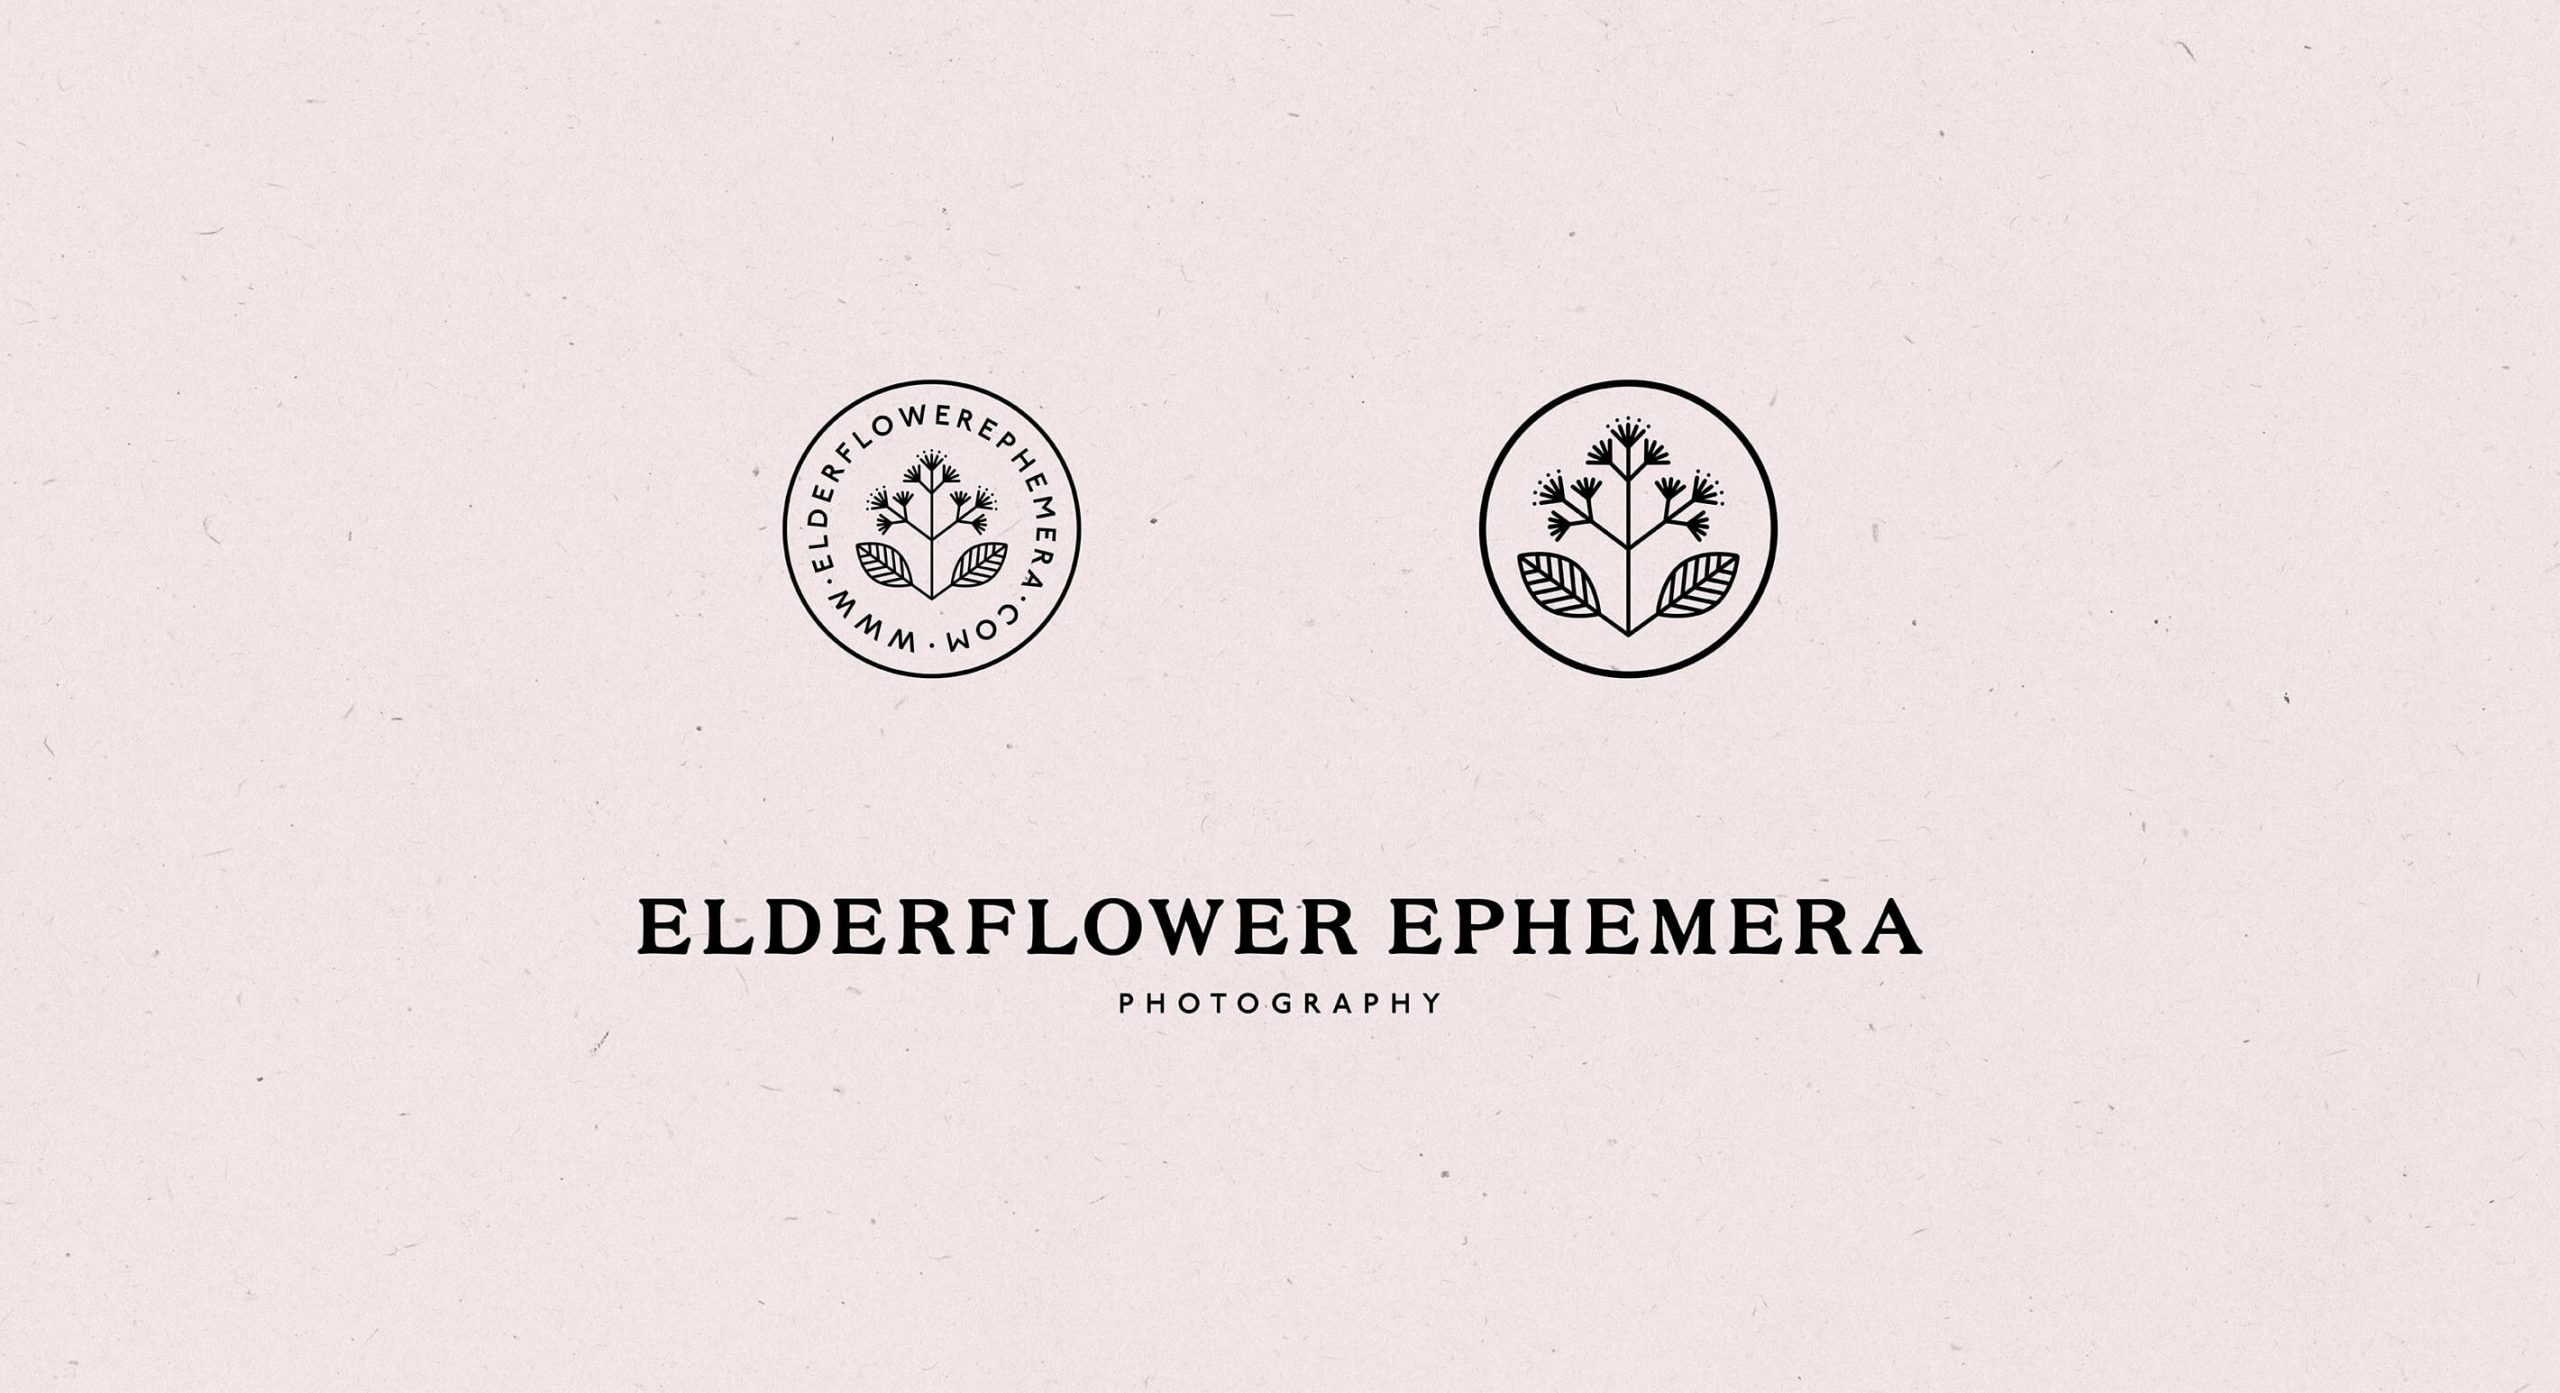 Obscurio & Co brand identity design for film photographer elderflower ephemera